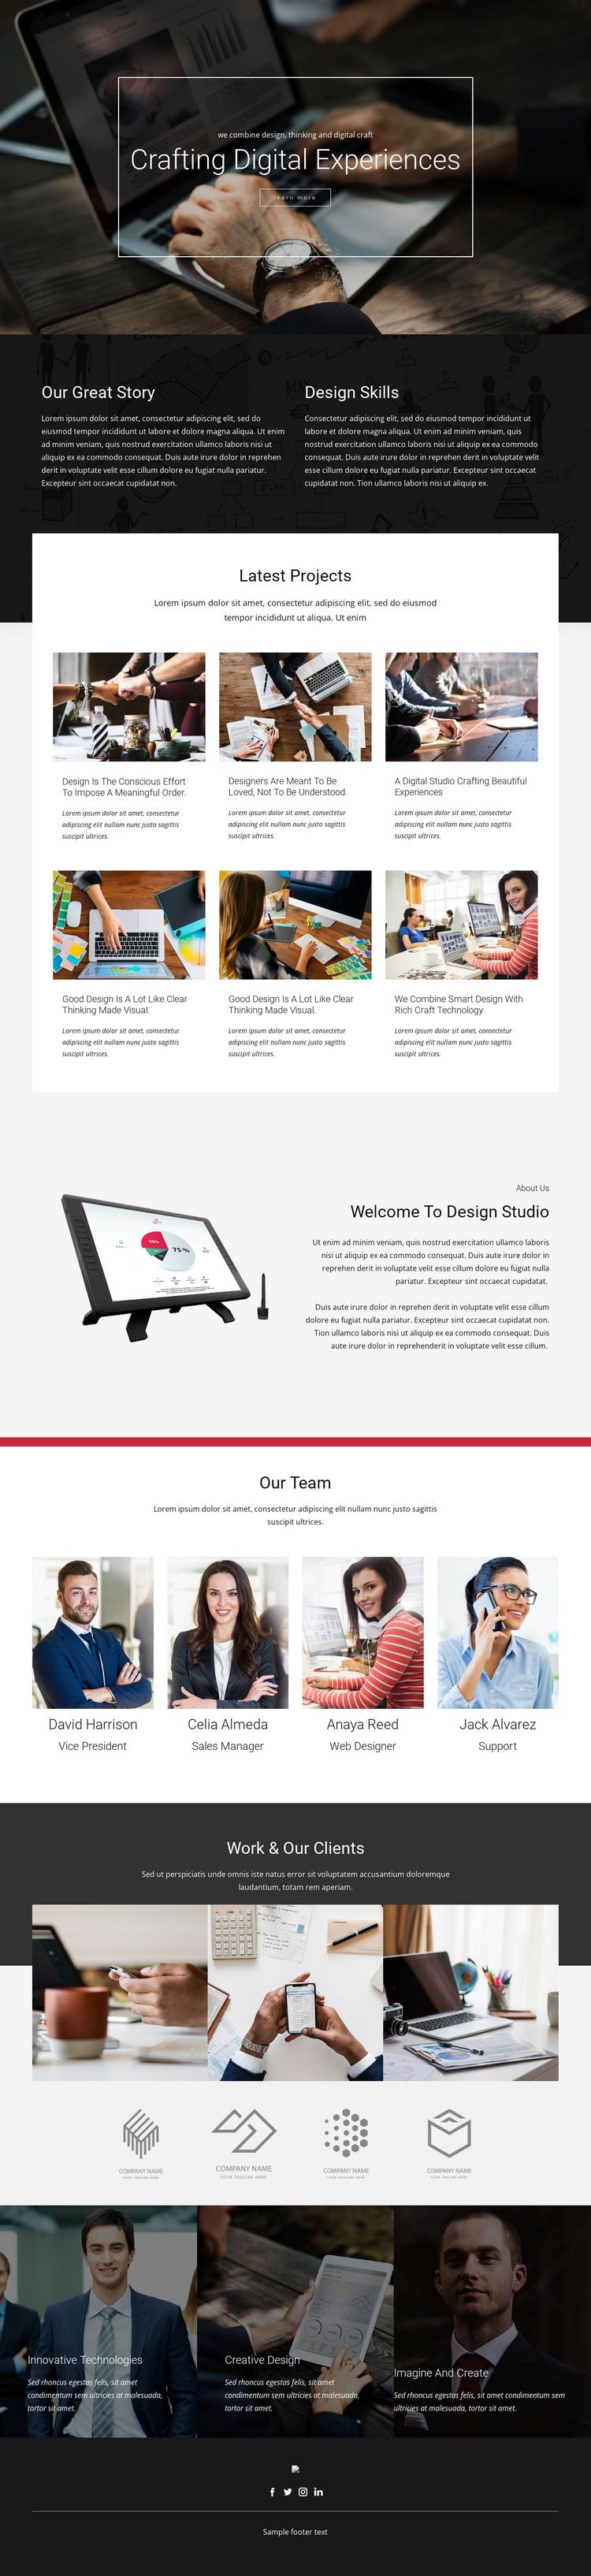 Crafting Digital Design Studio Website Builder Software